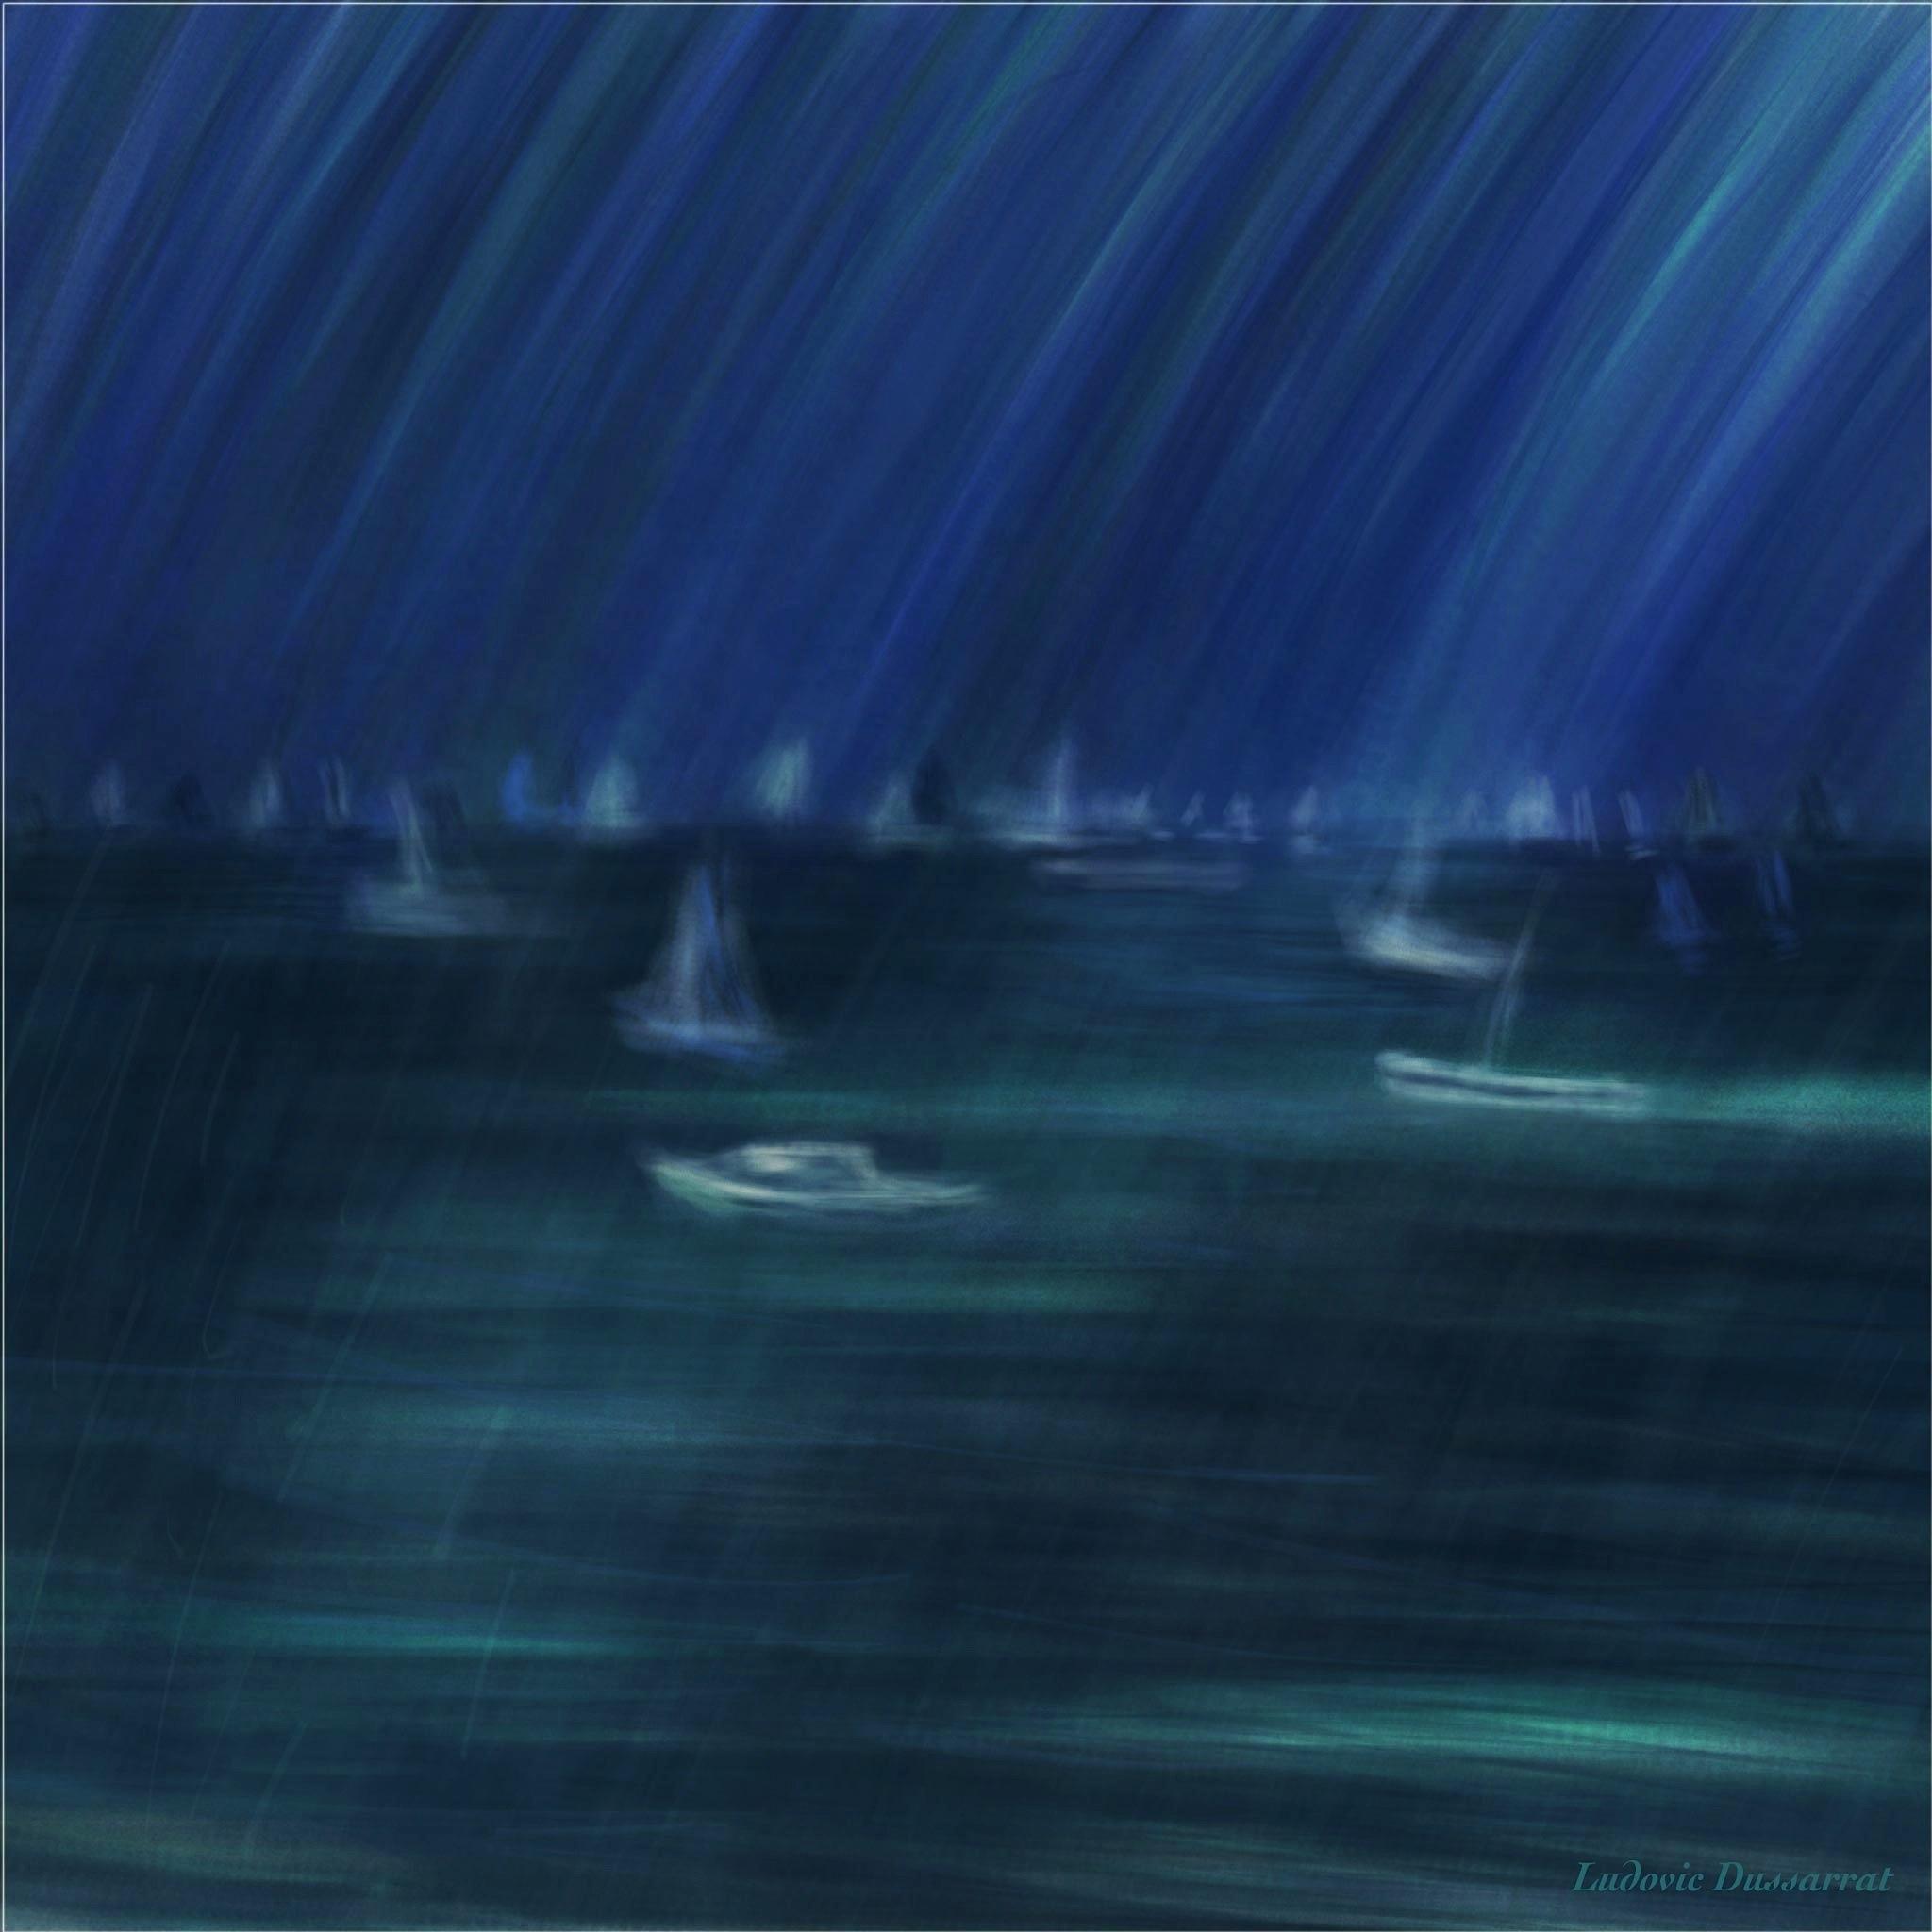 Averses sur le Bassin. Digital painting, 72x72, 2015